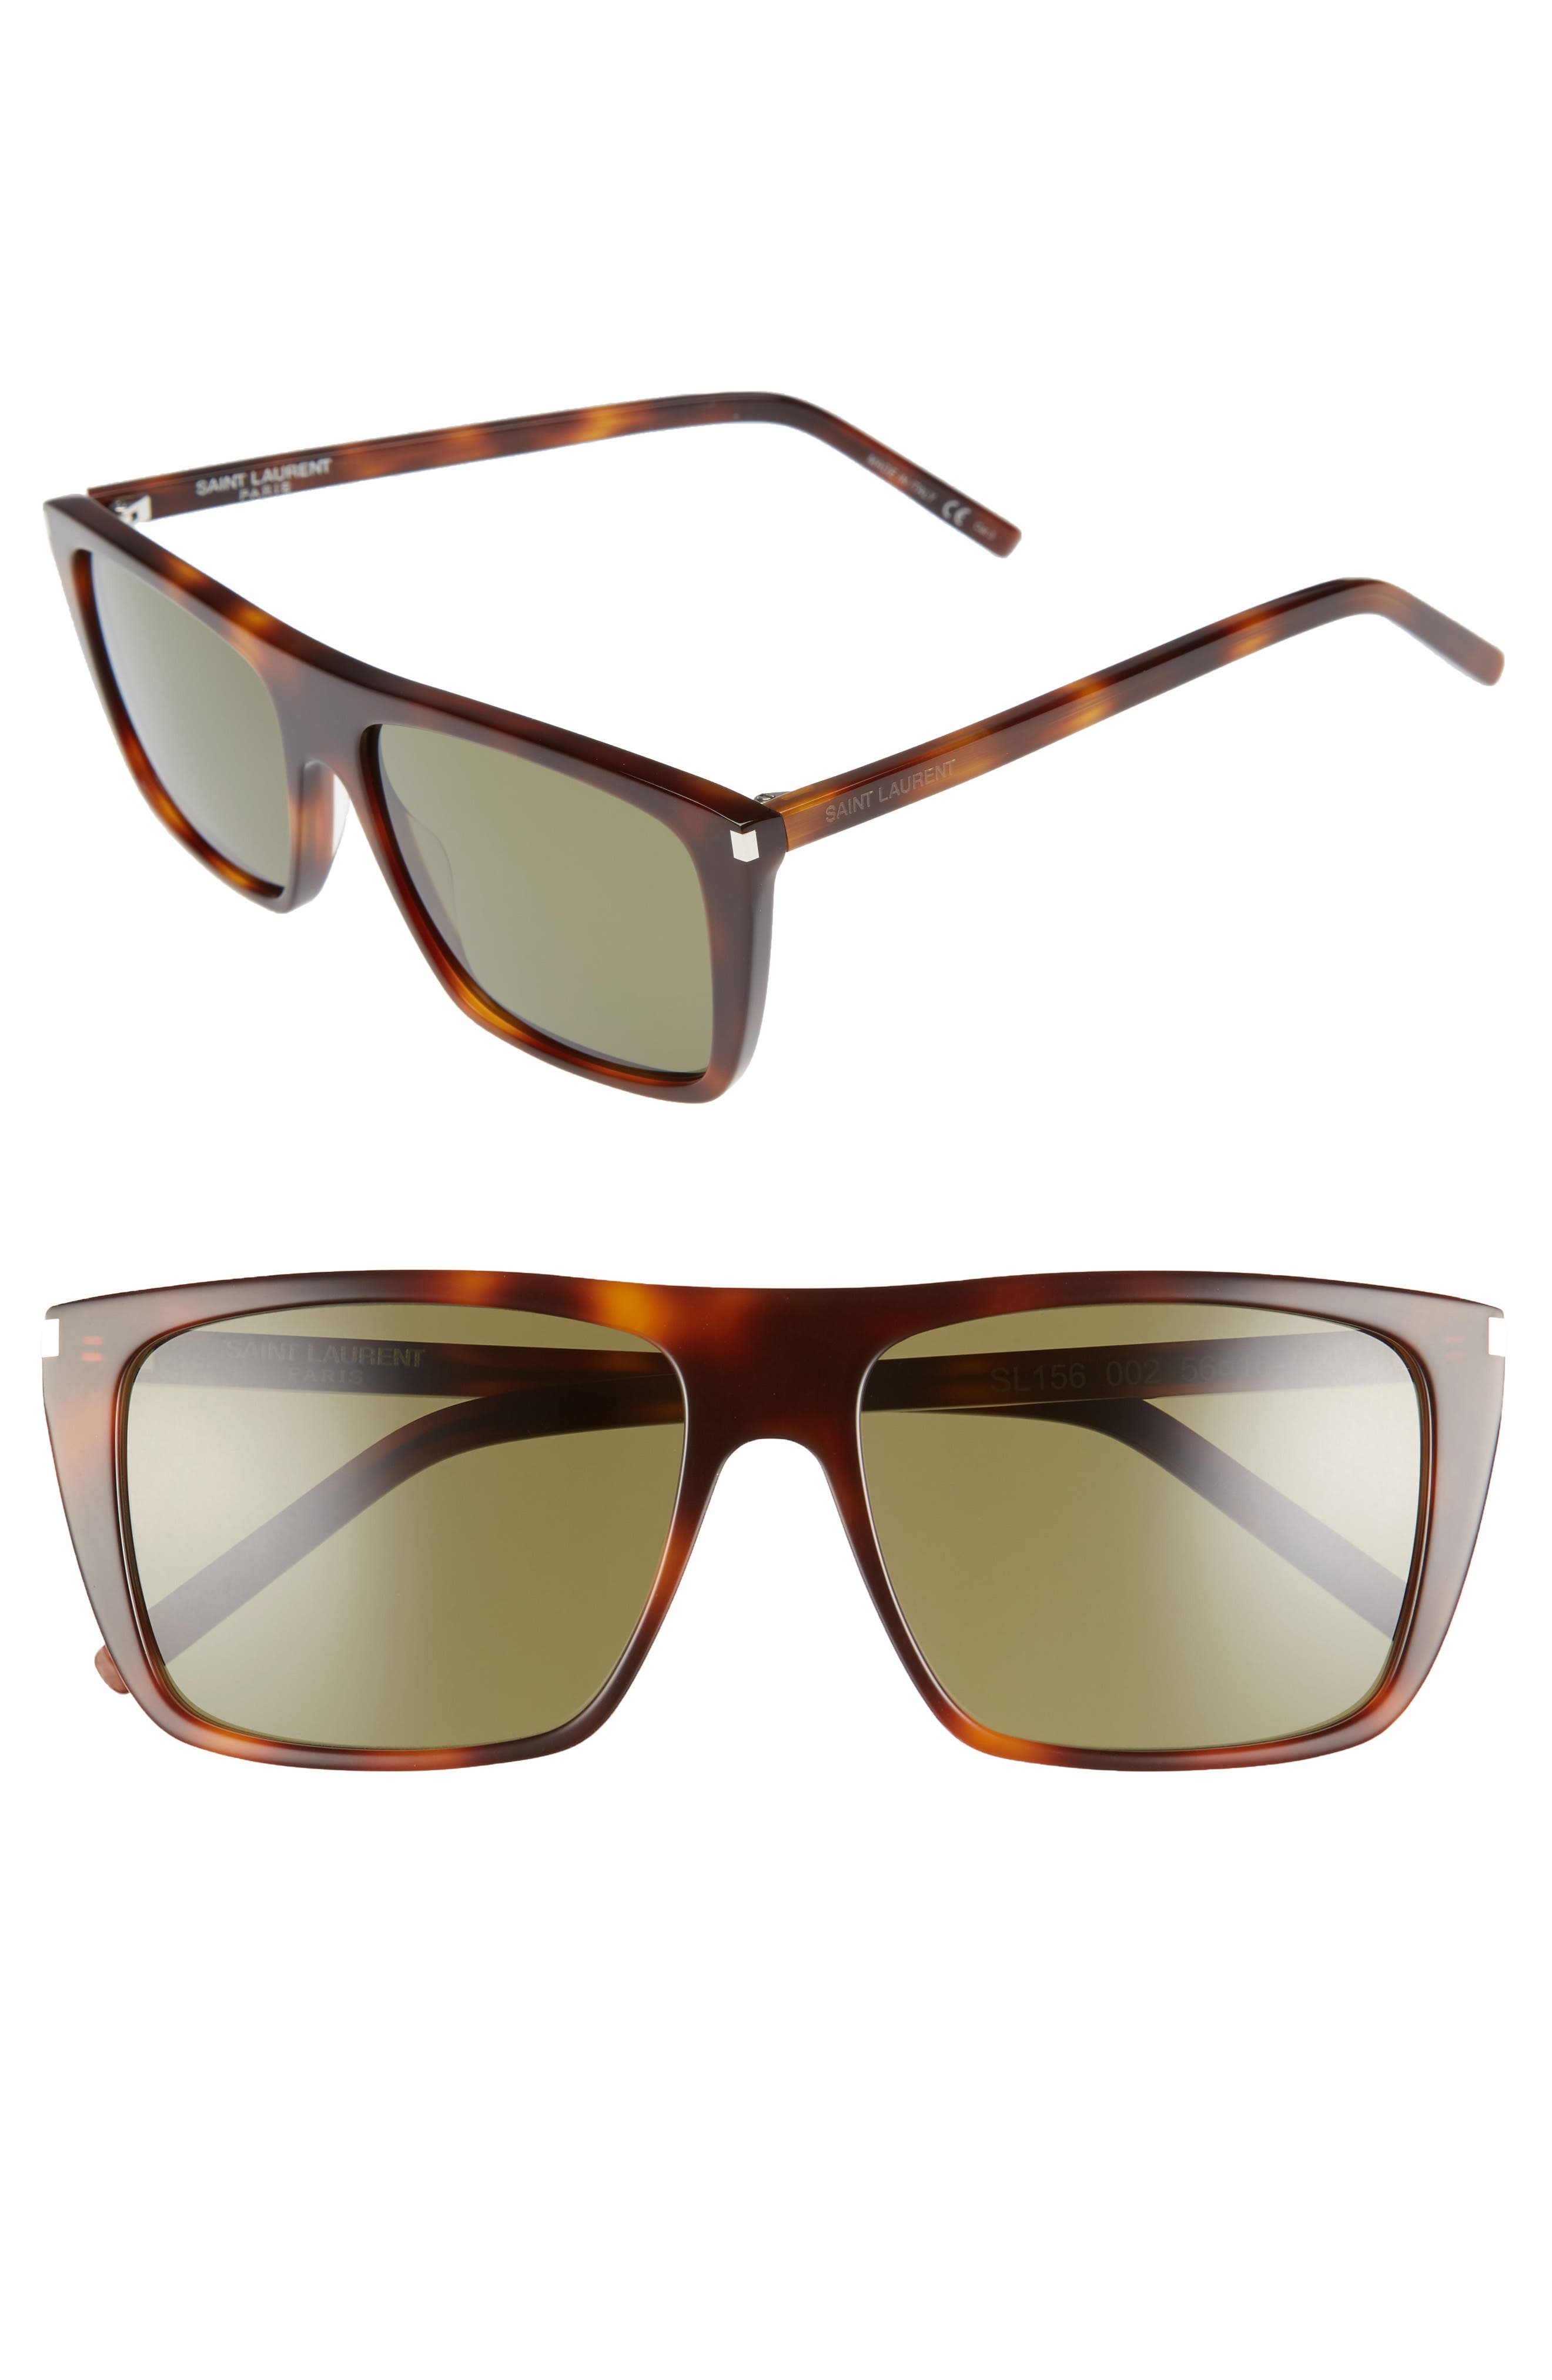 Avana 56mm Flat Top Sunglasses,                         Main,                         color, Havana